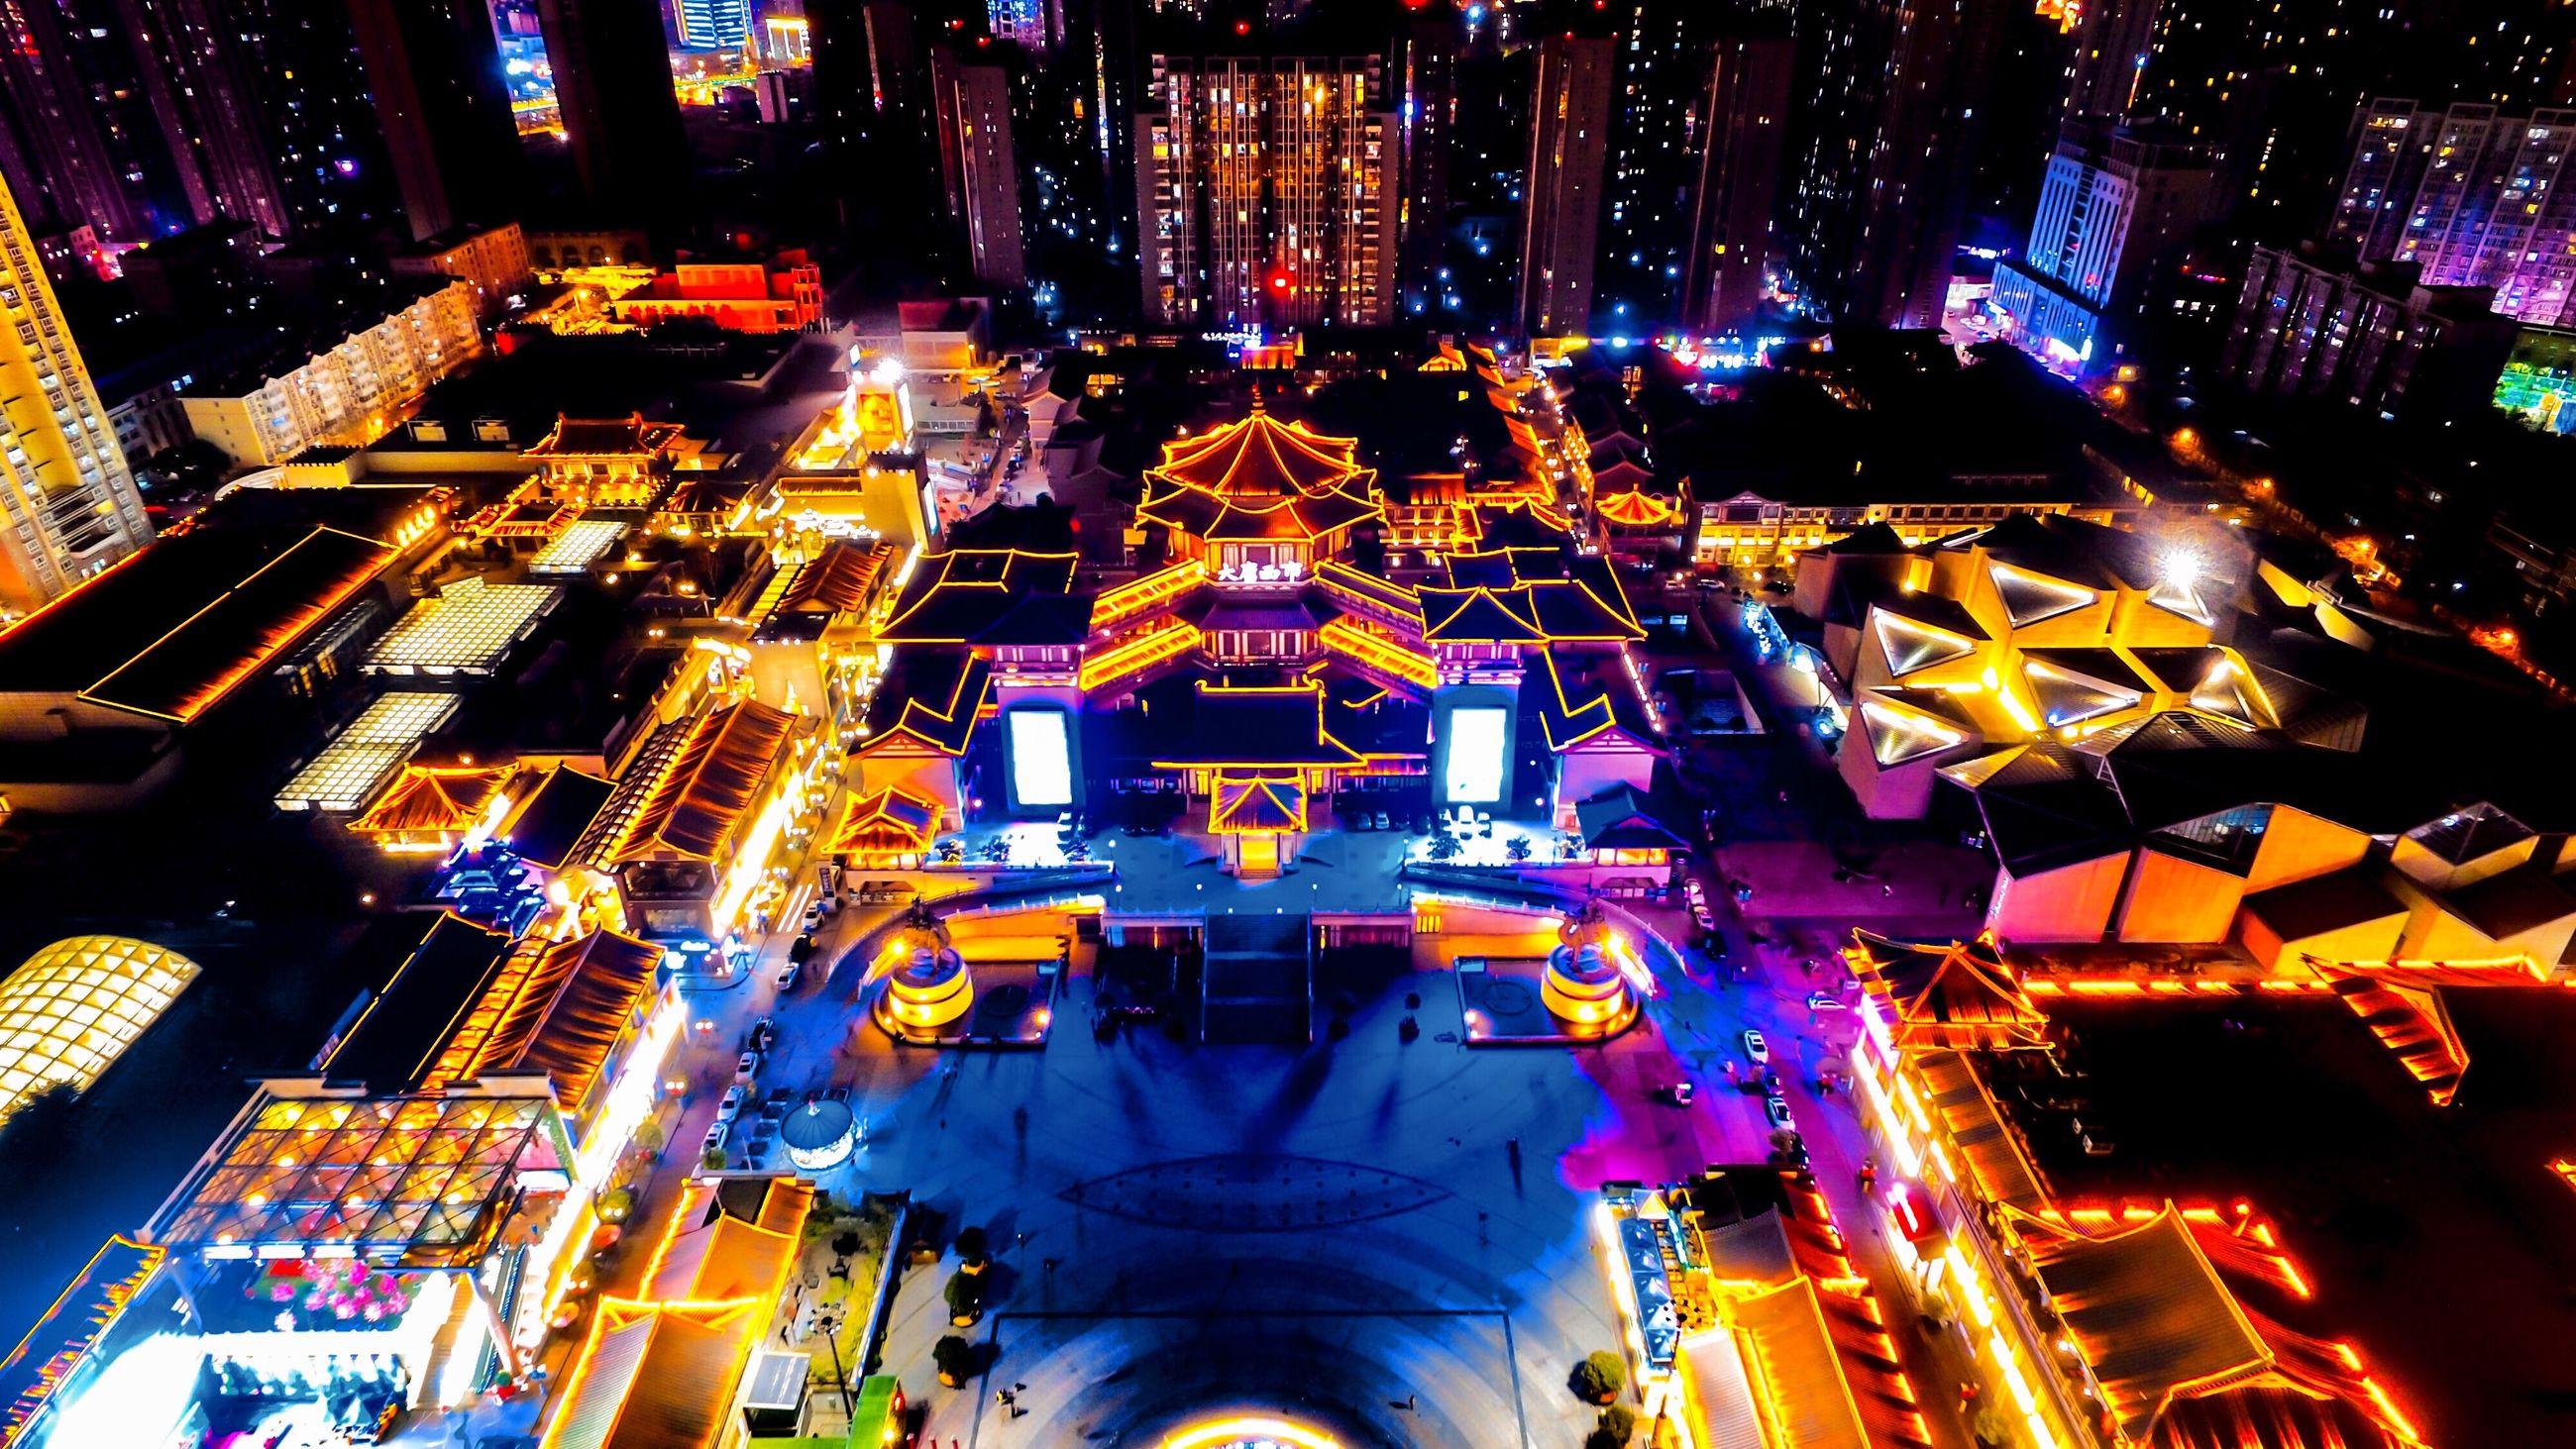 illuminated, travel destinations, night, urban skyline, modern, city, sky, skyscraper, cityscape, no people, outdoors